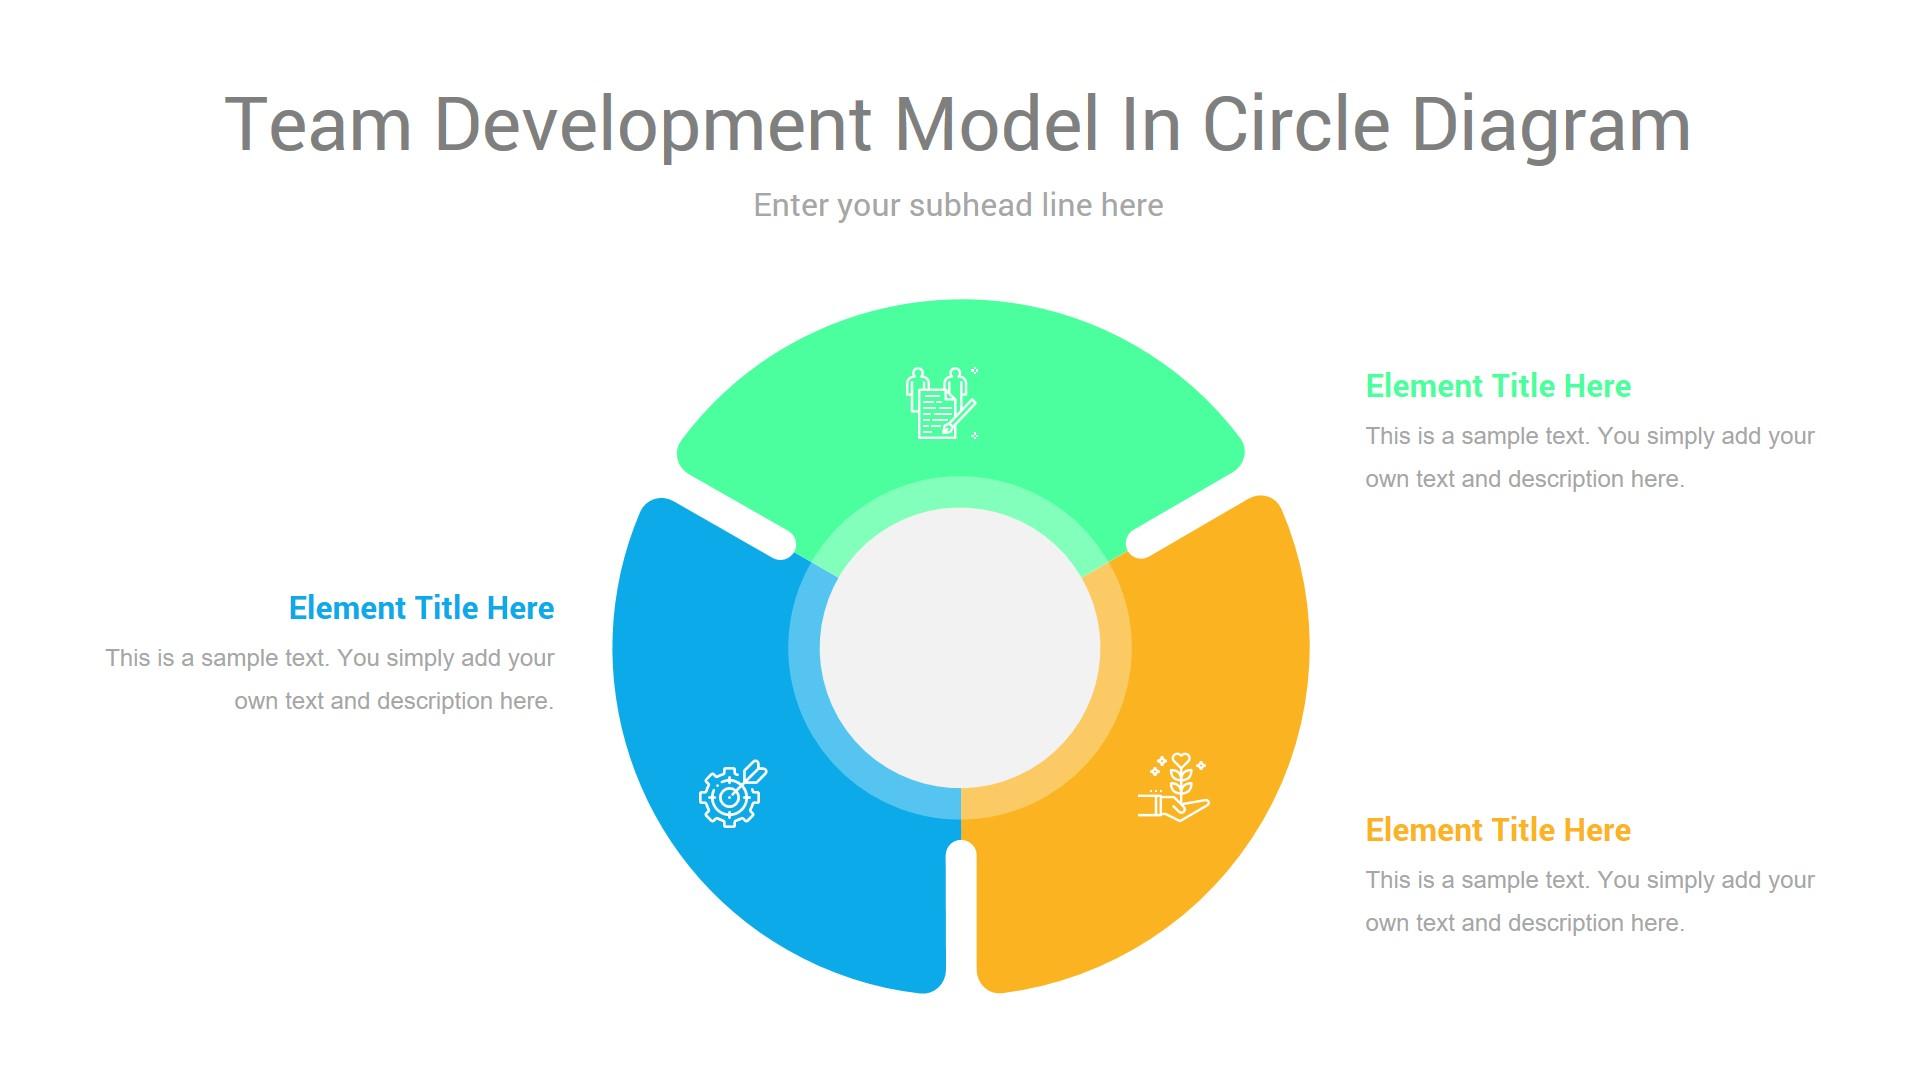 Team development model in circle diagram